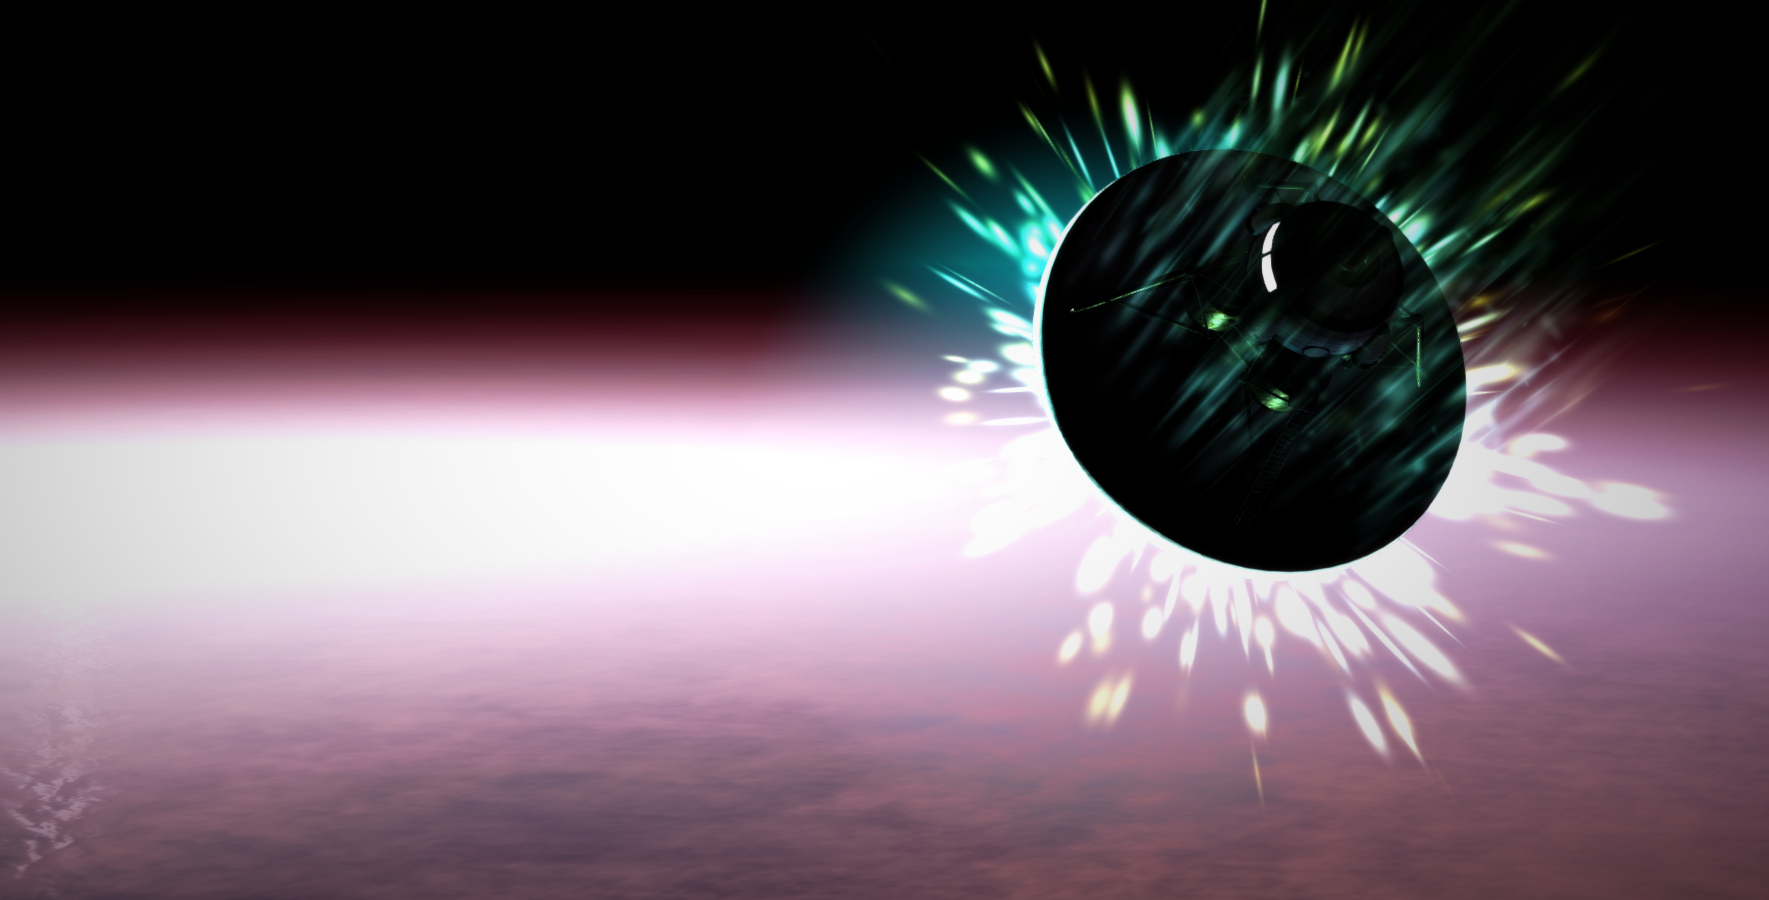 Lander entering Planet X's atmosphere